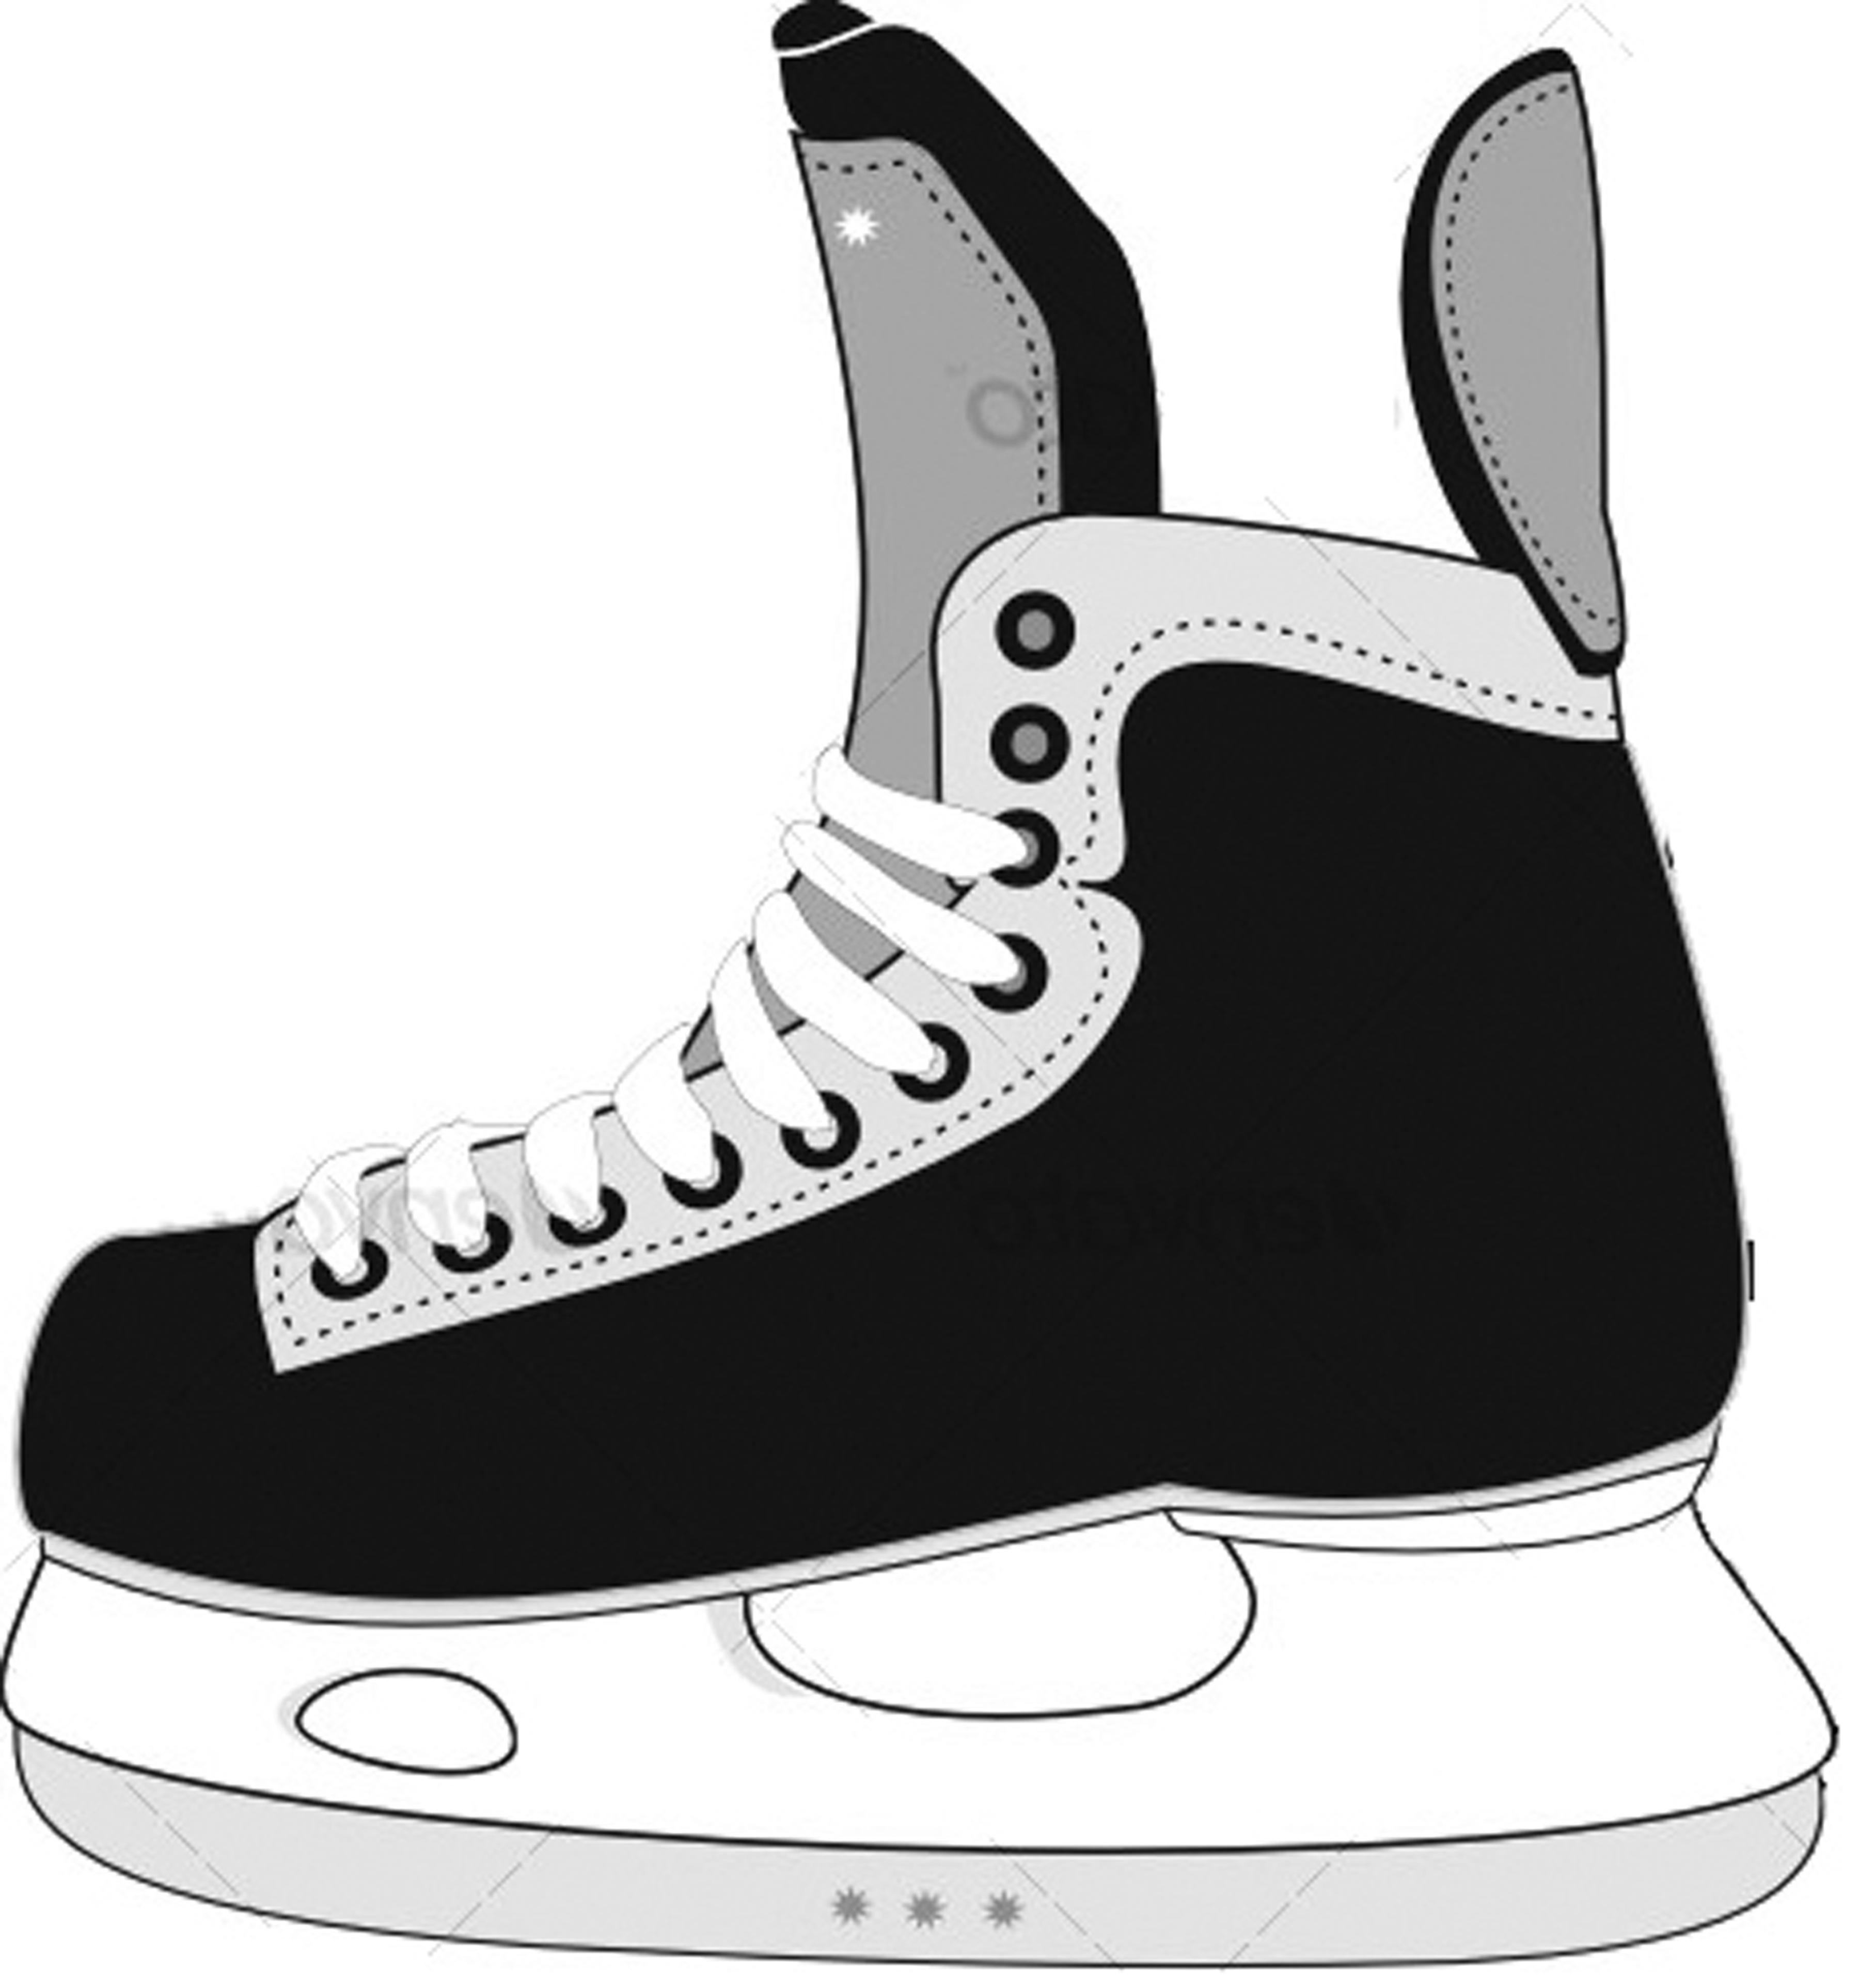 Hockey Skate Clipart #1